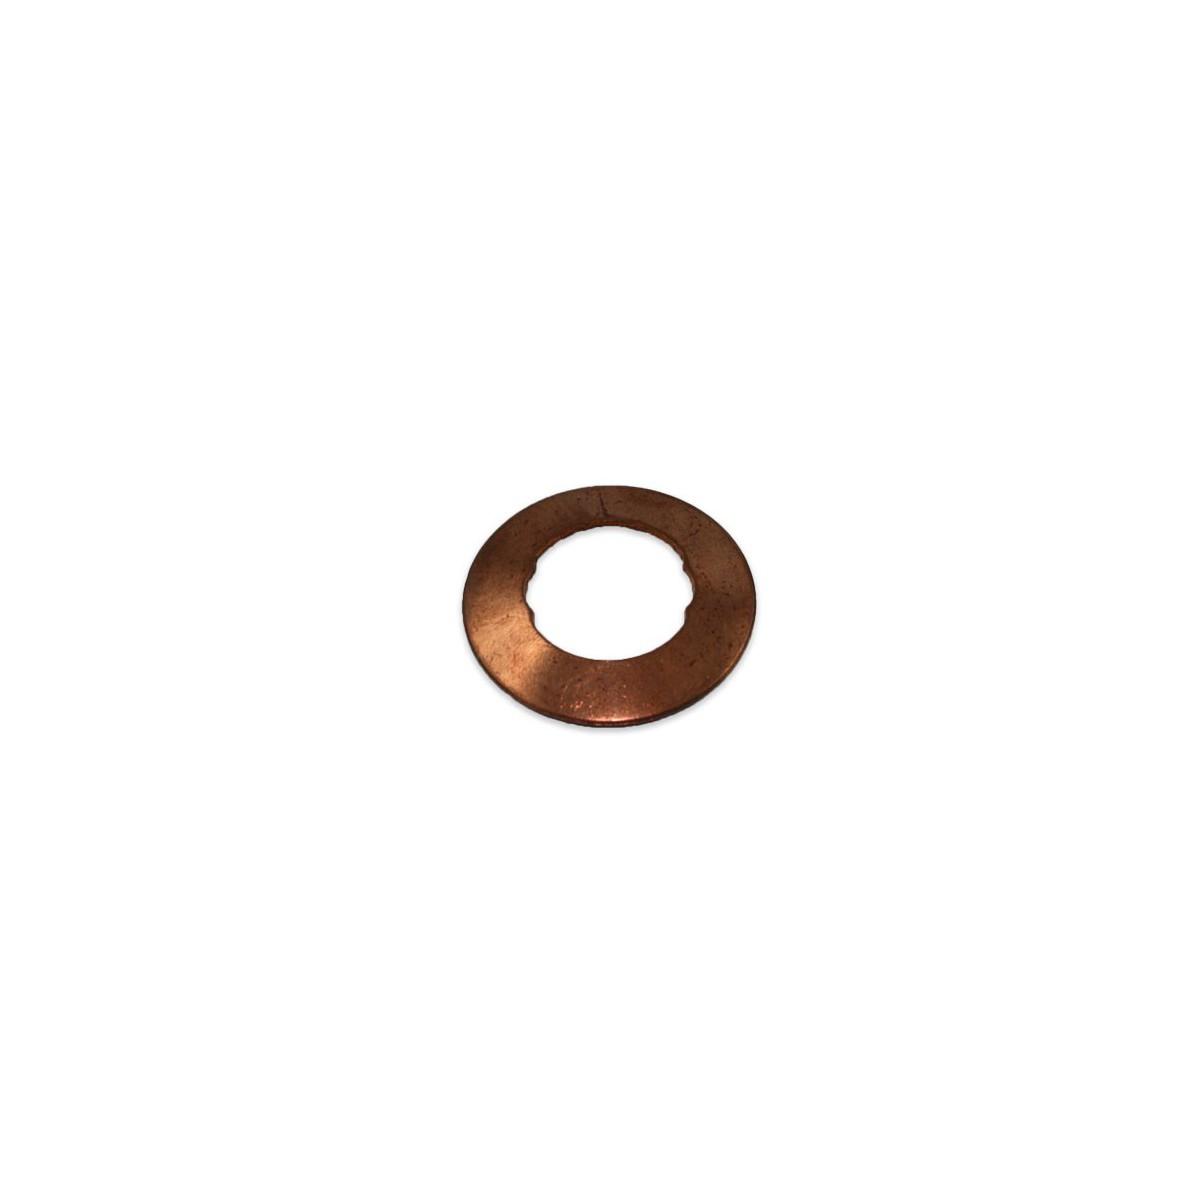 Convex copper washer 20x38mm Iseki